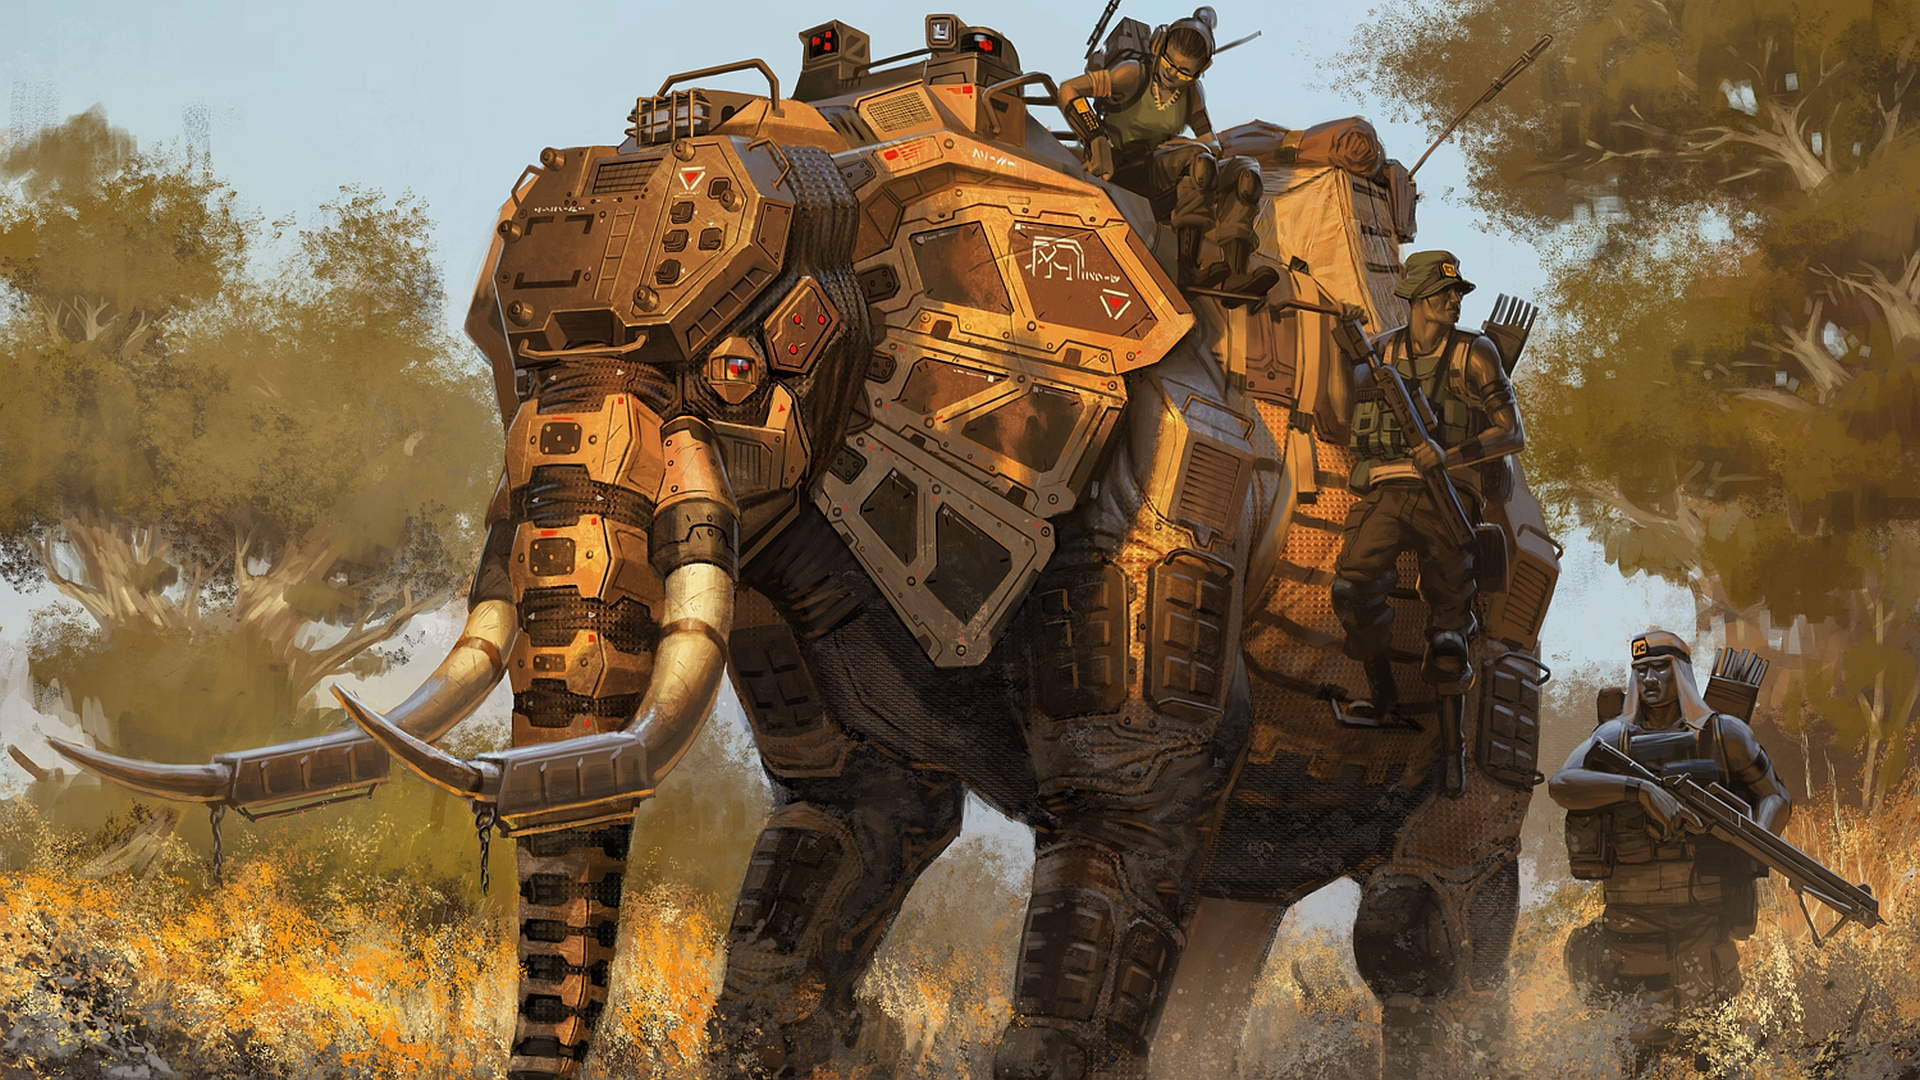 Elephant HD Desktop Background wallpaper